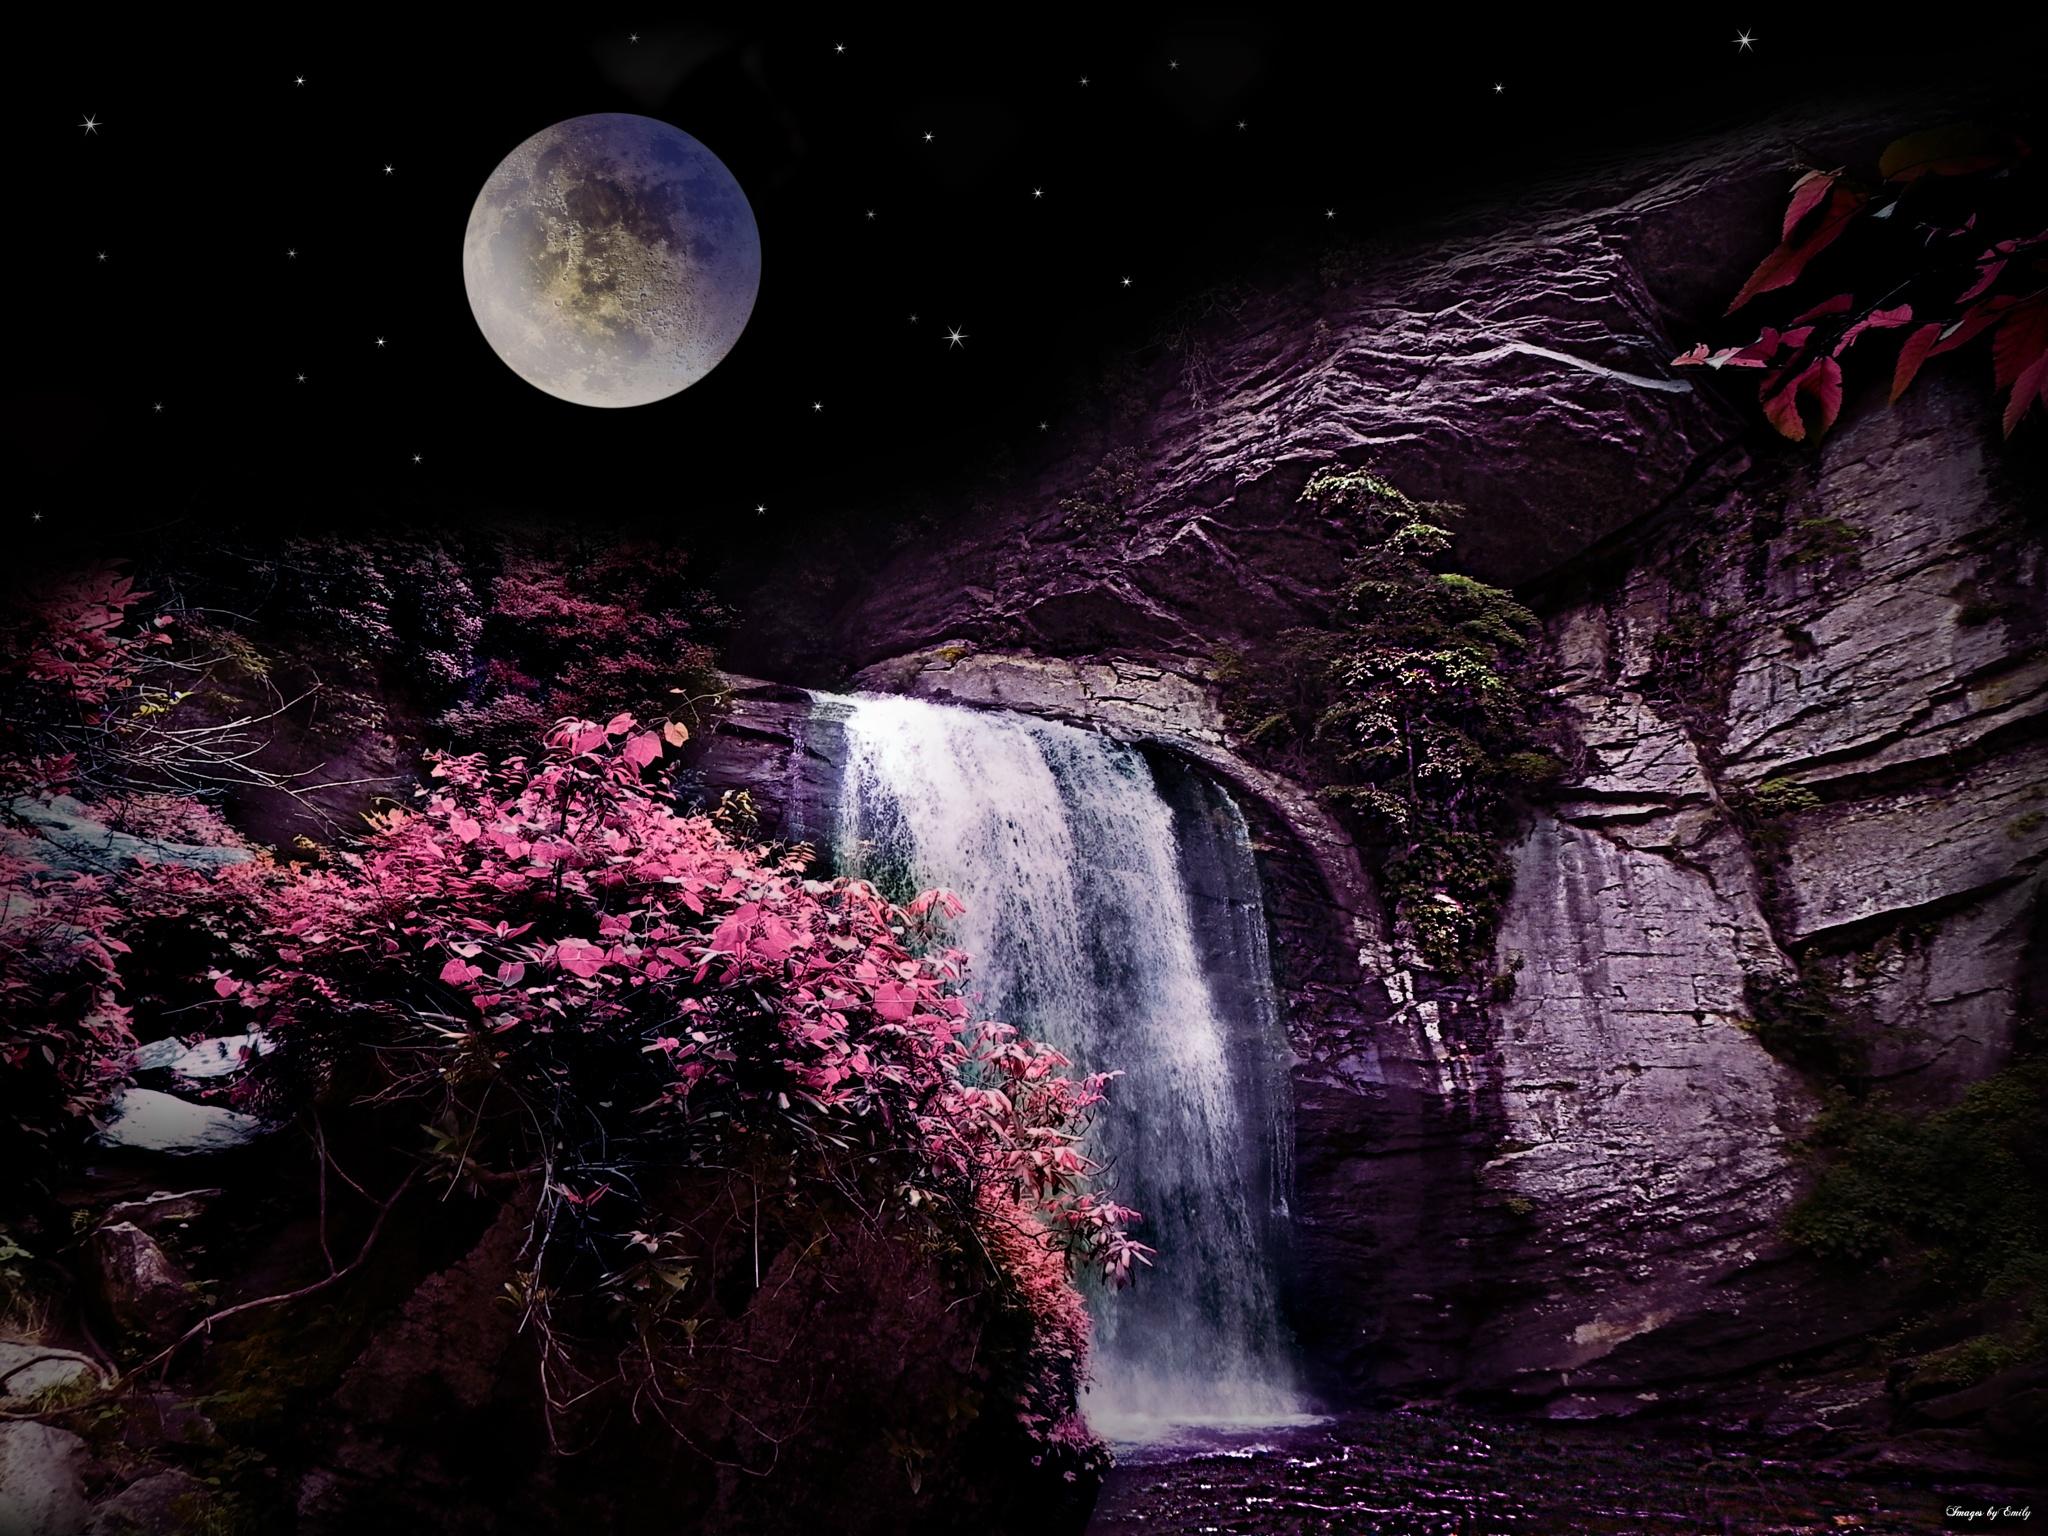 Purple Mountain Majesty by Emily Grant